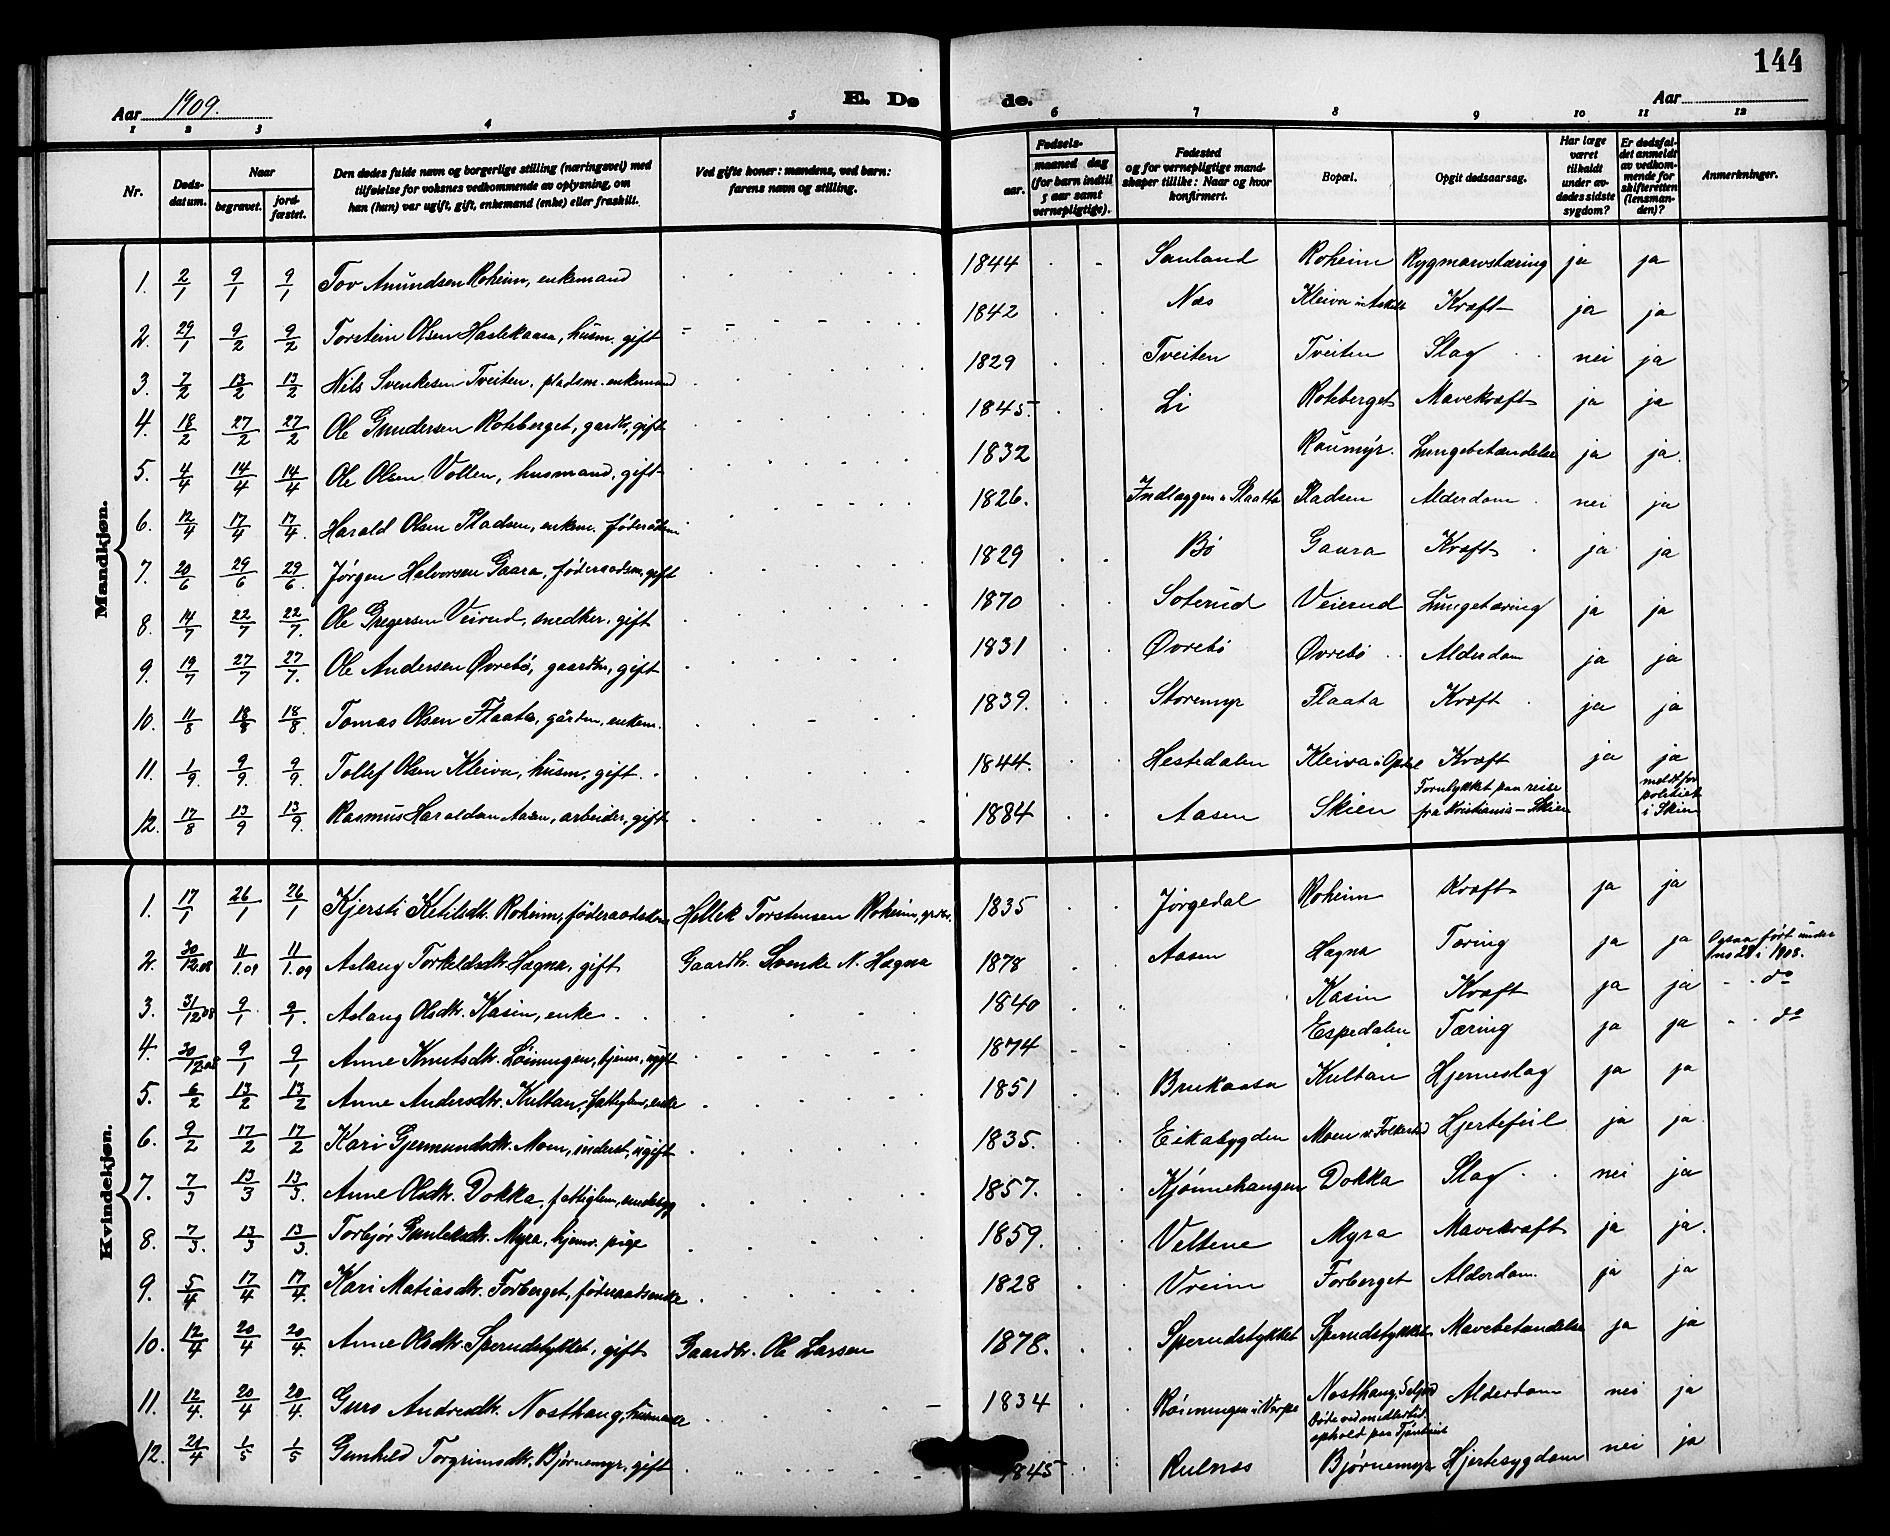 SAKO, Bø kirkebøker, G/Ga/L0007: Klokkerbok nr. 7, 1909-1924, s. 144